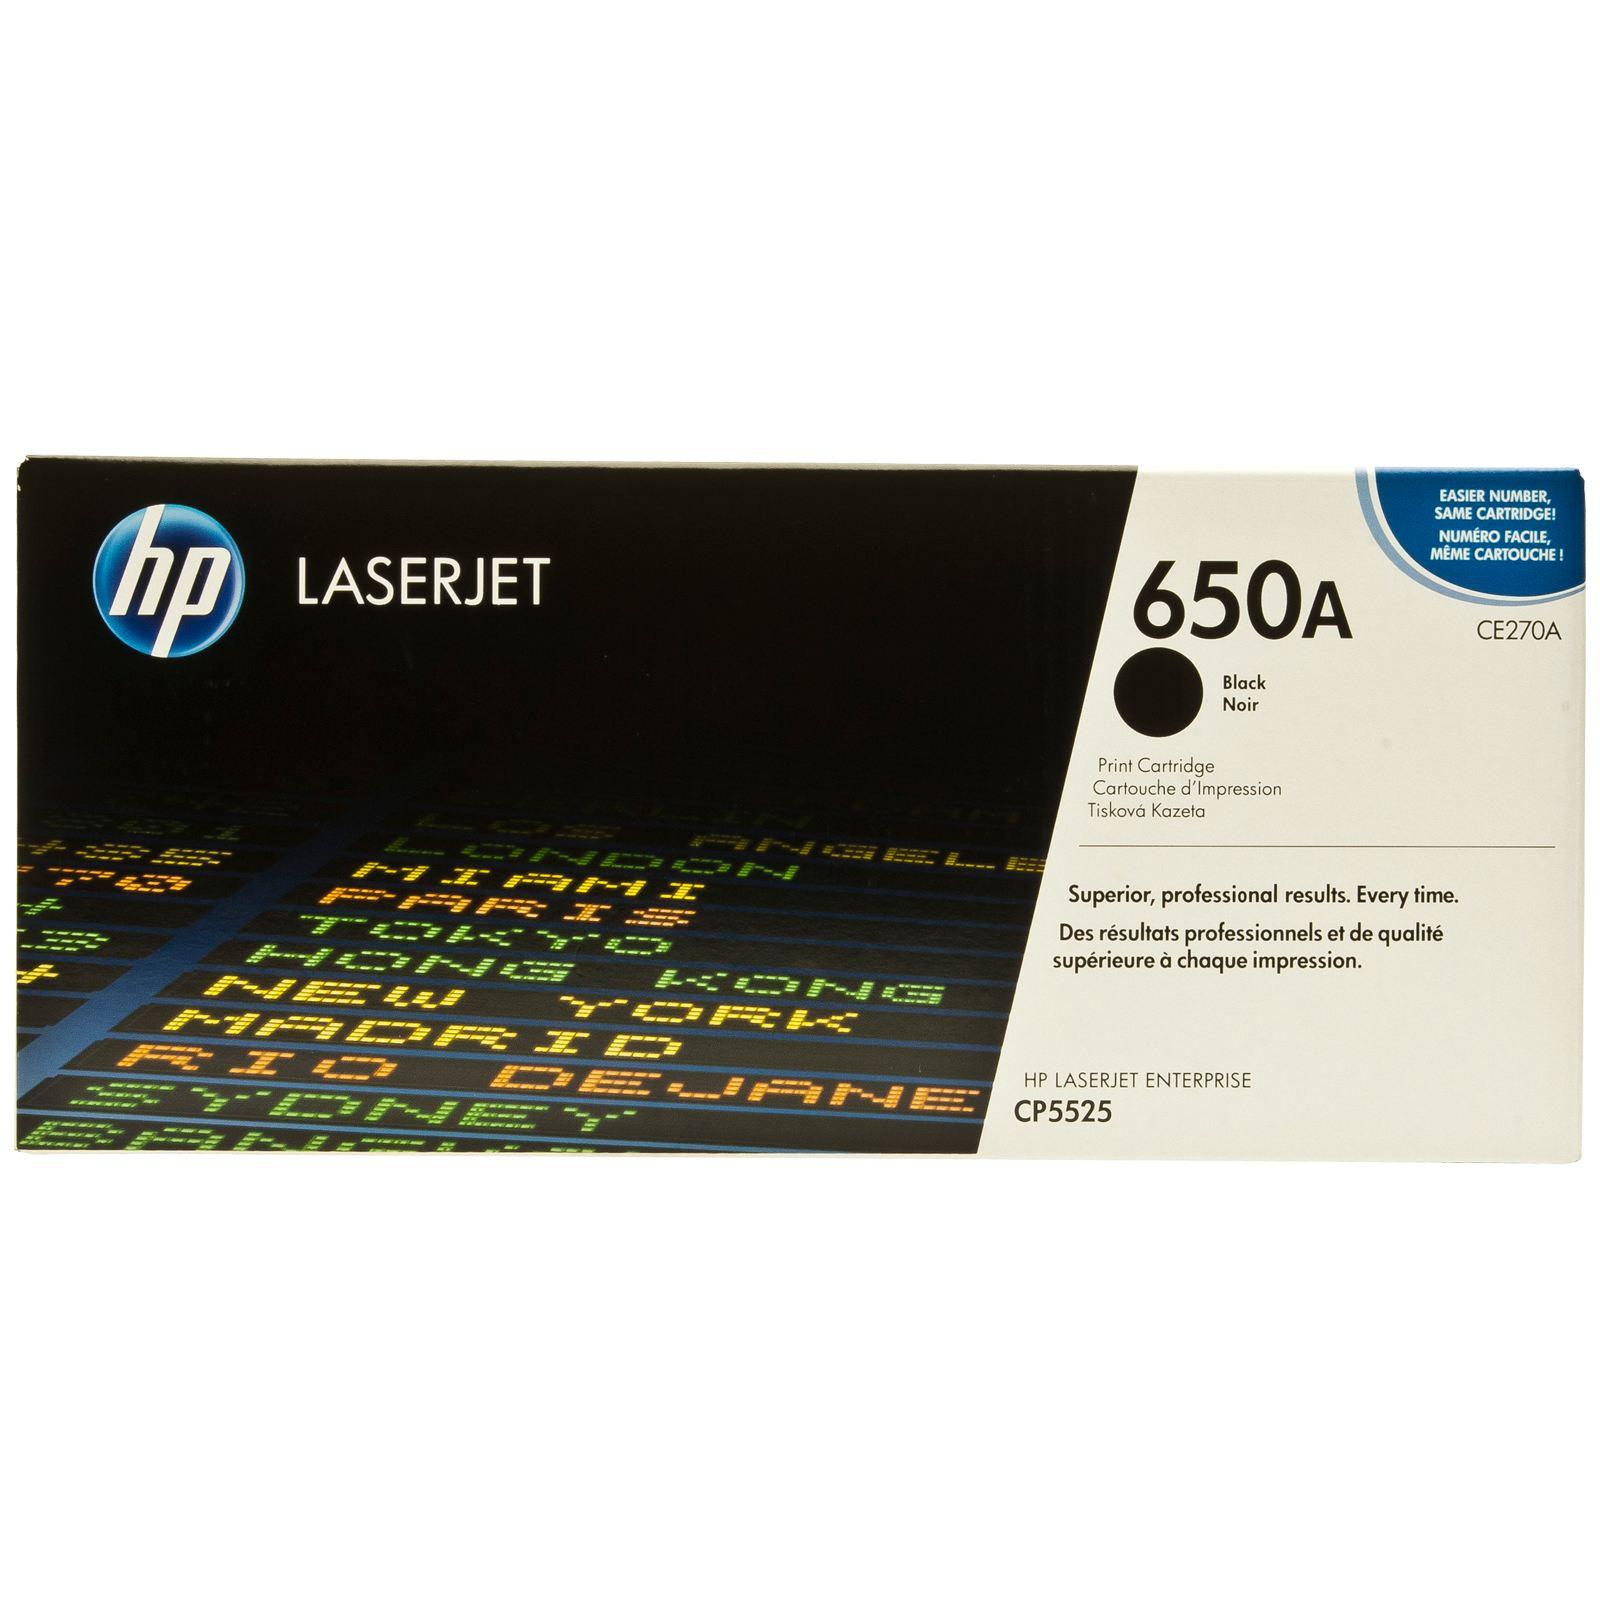 Заправка картриджа CE270A для HP Color LaserJet Enterprise CP5525